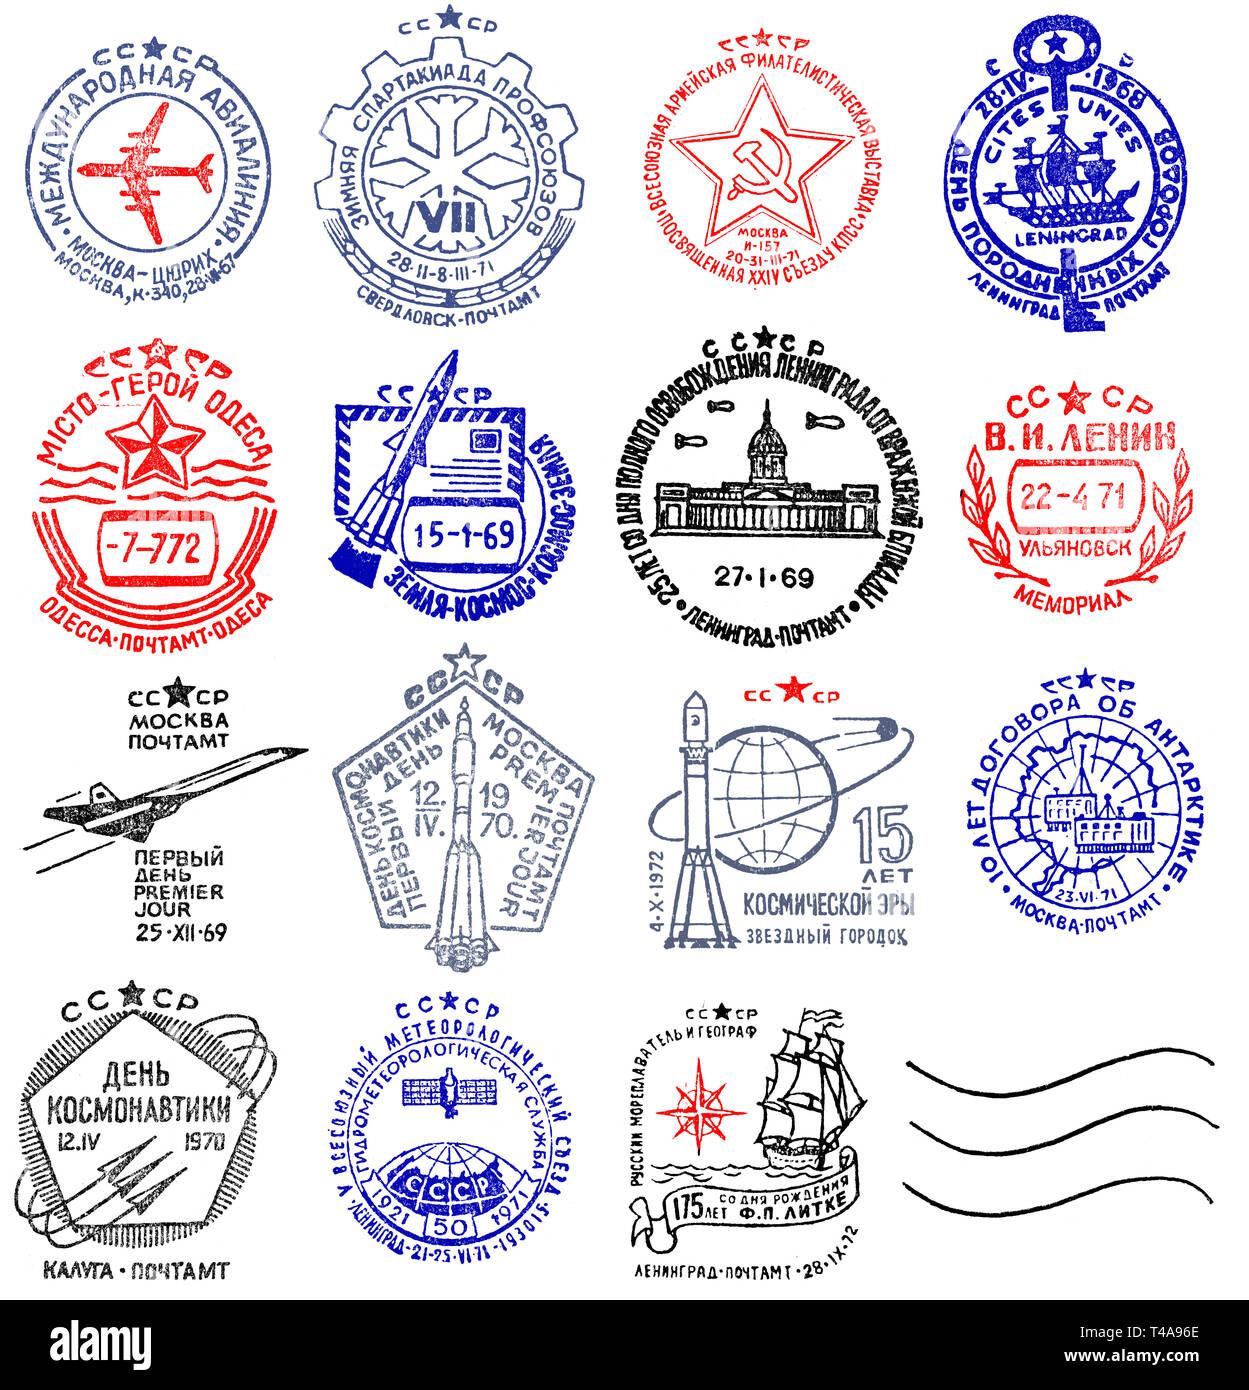 Vintage USSR postage meter stamps collection - Stock Image